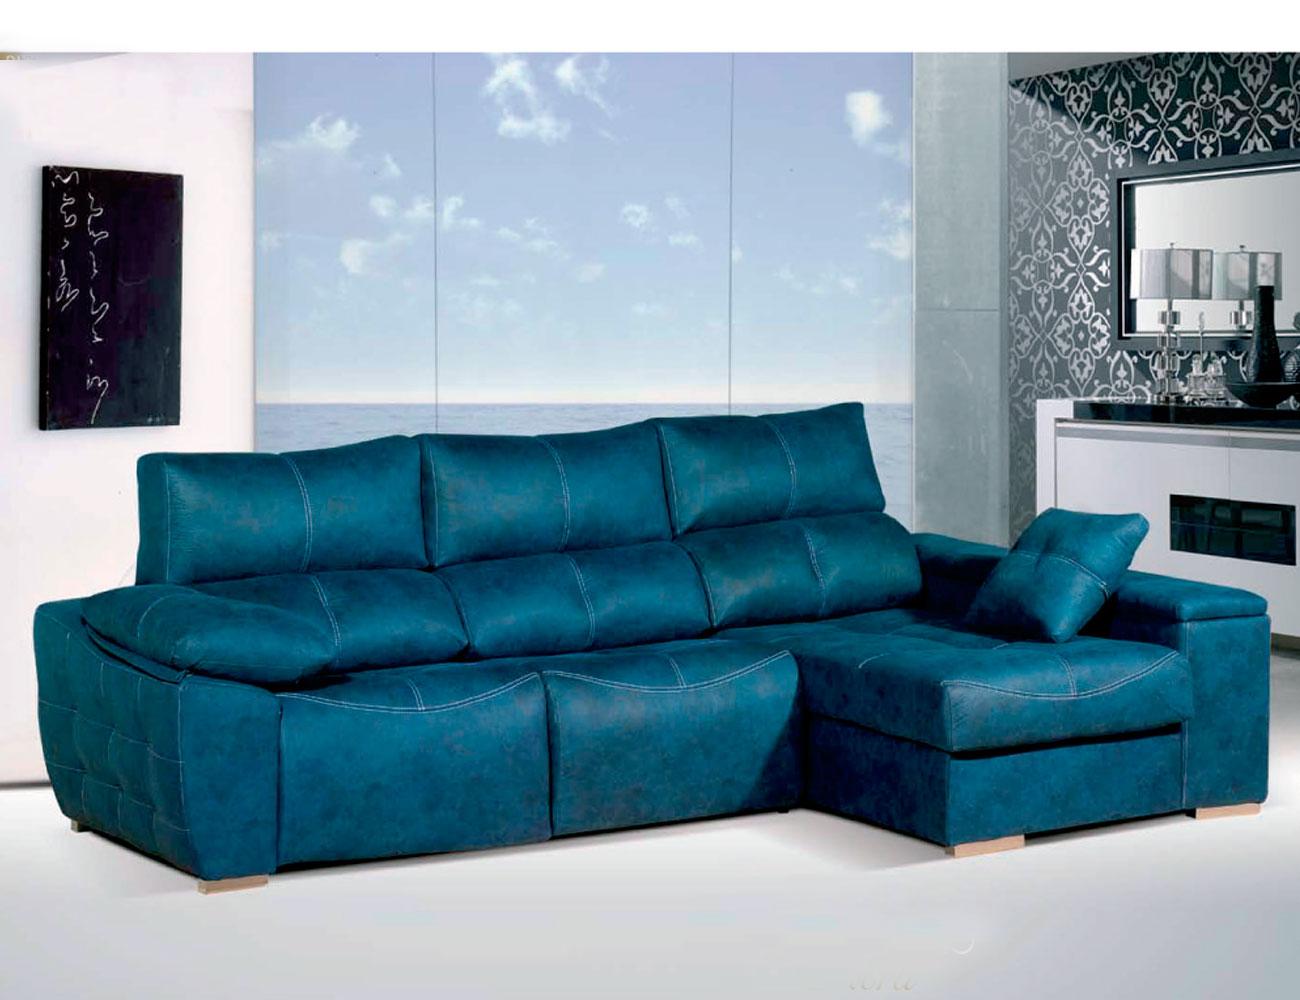 Sofa chaiselongue relax 2 motores anti manchas turquesa41